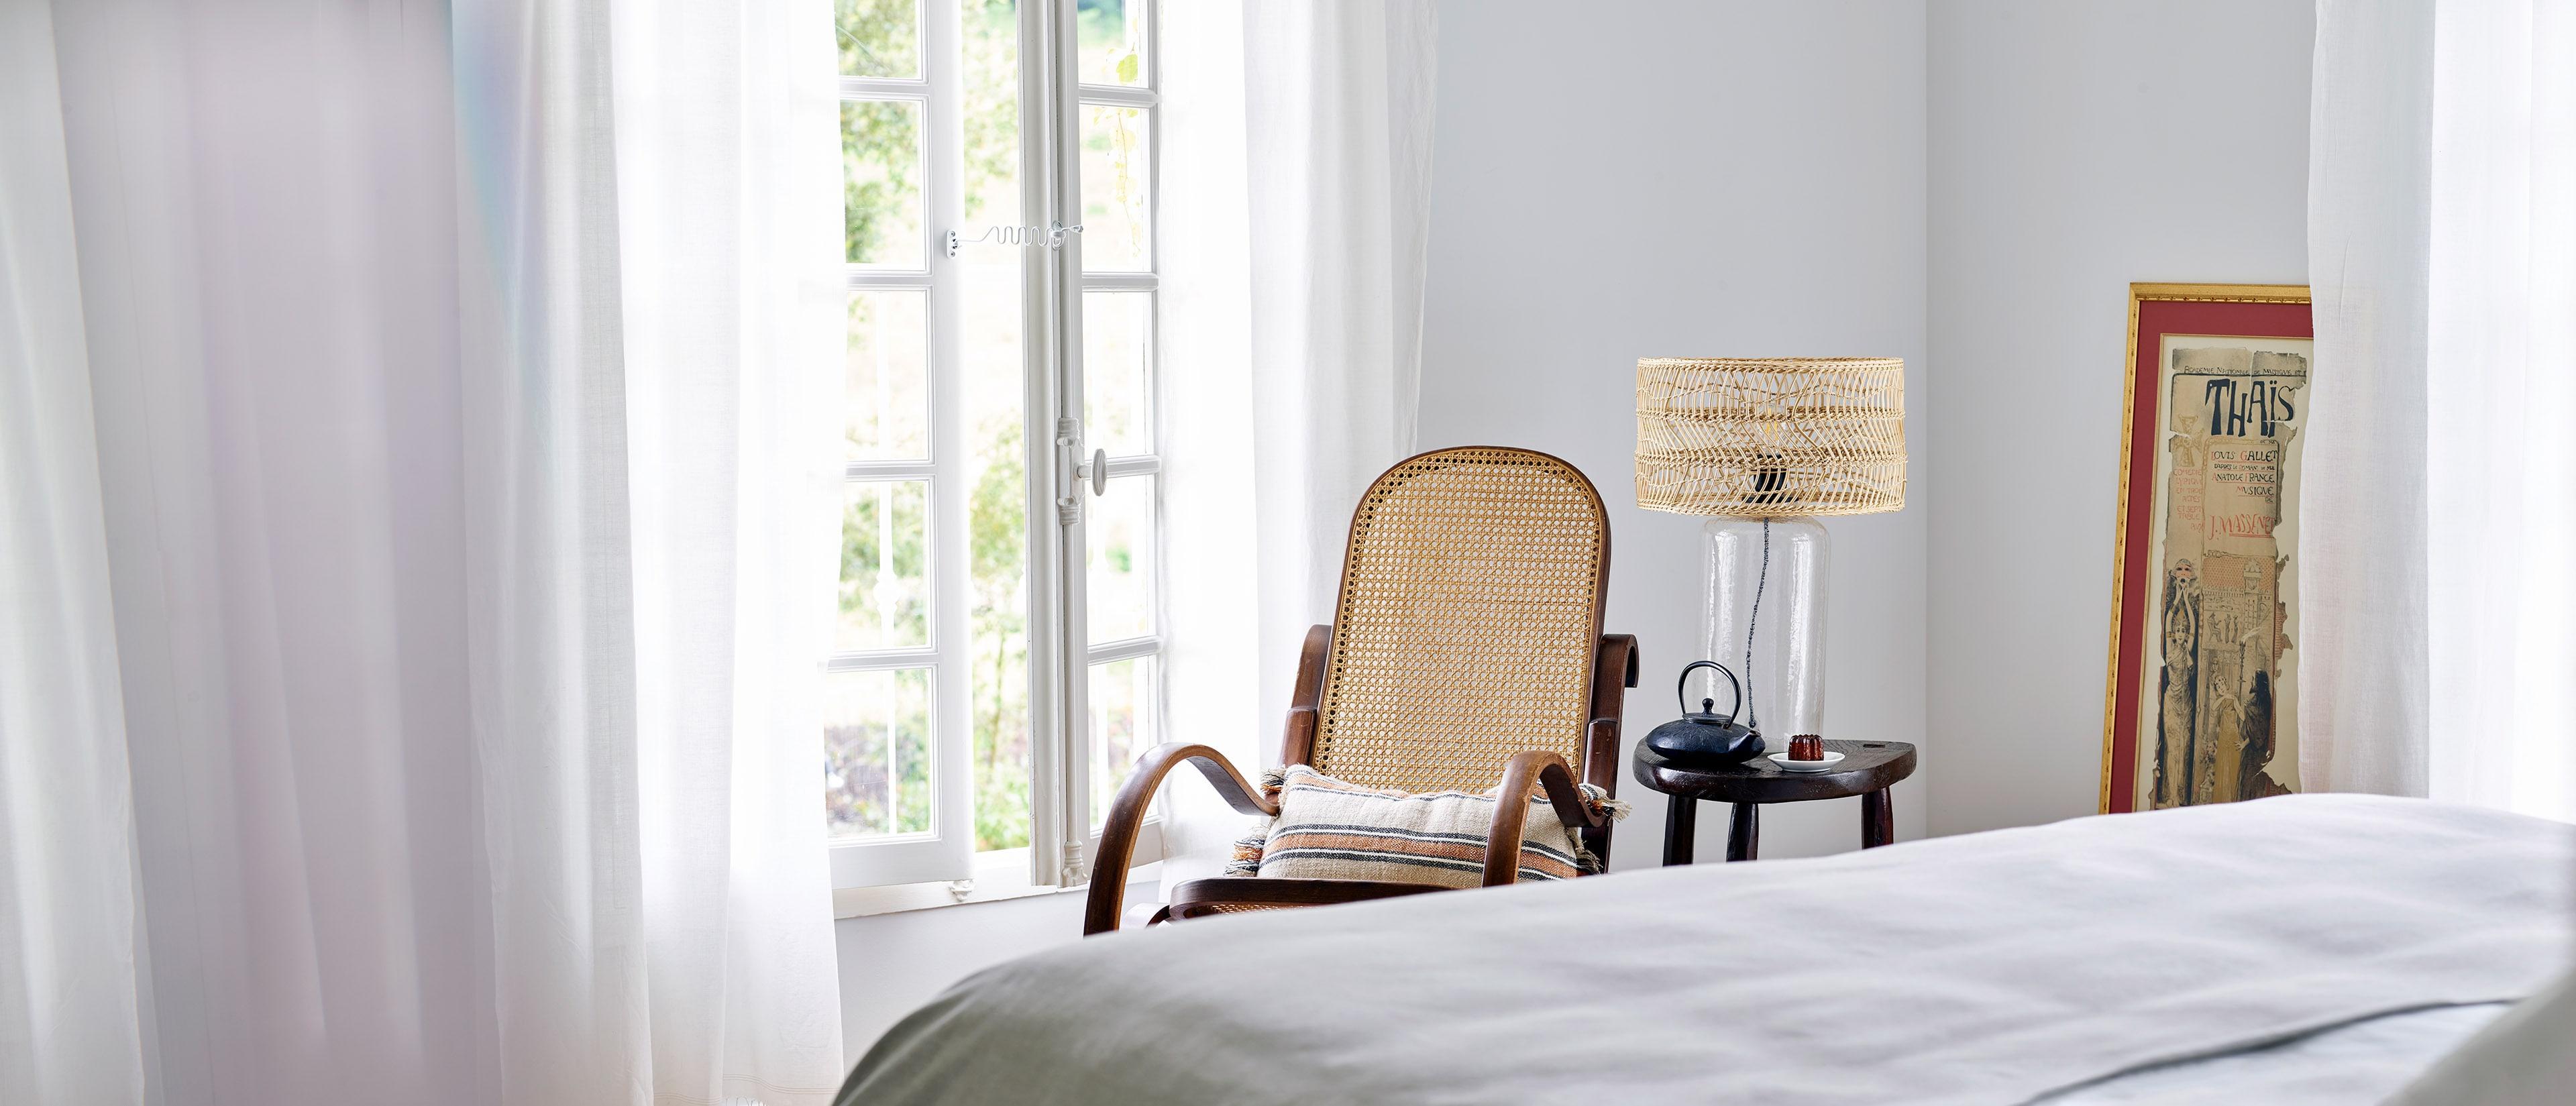 Richard Moran Pomoeria Luxury Interiors Lifestyle 001